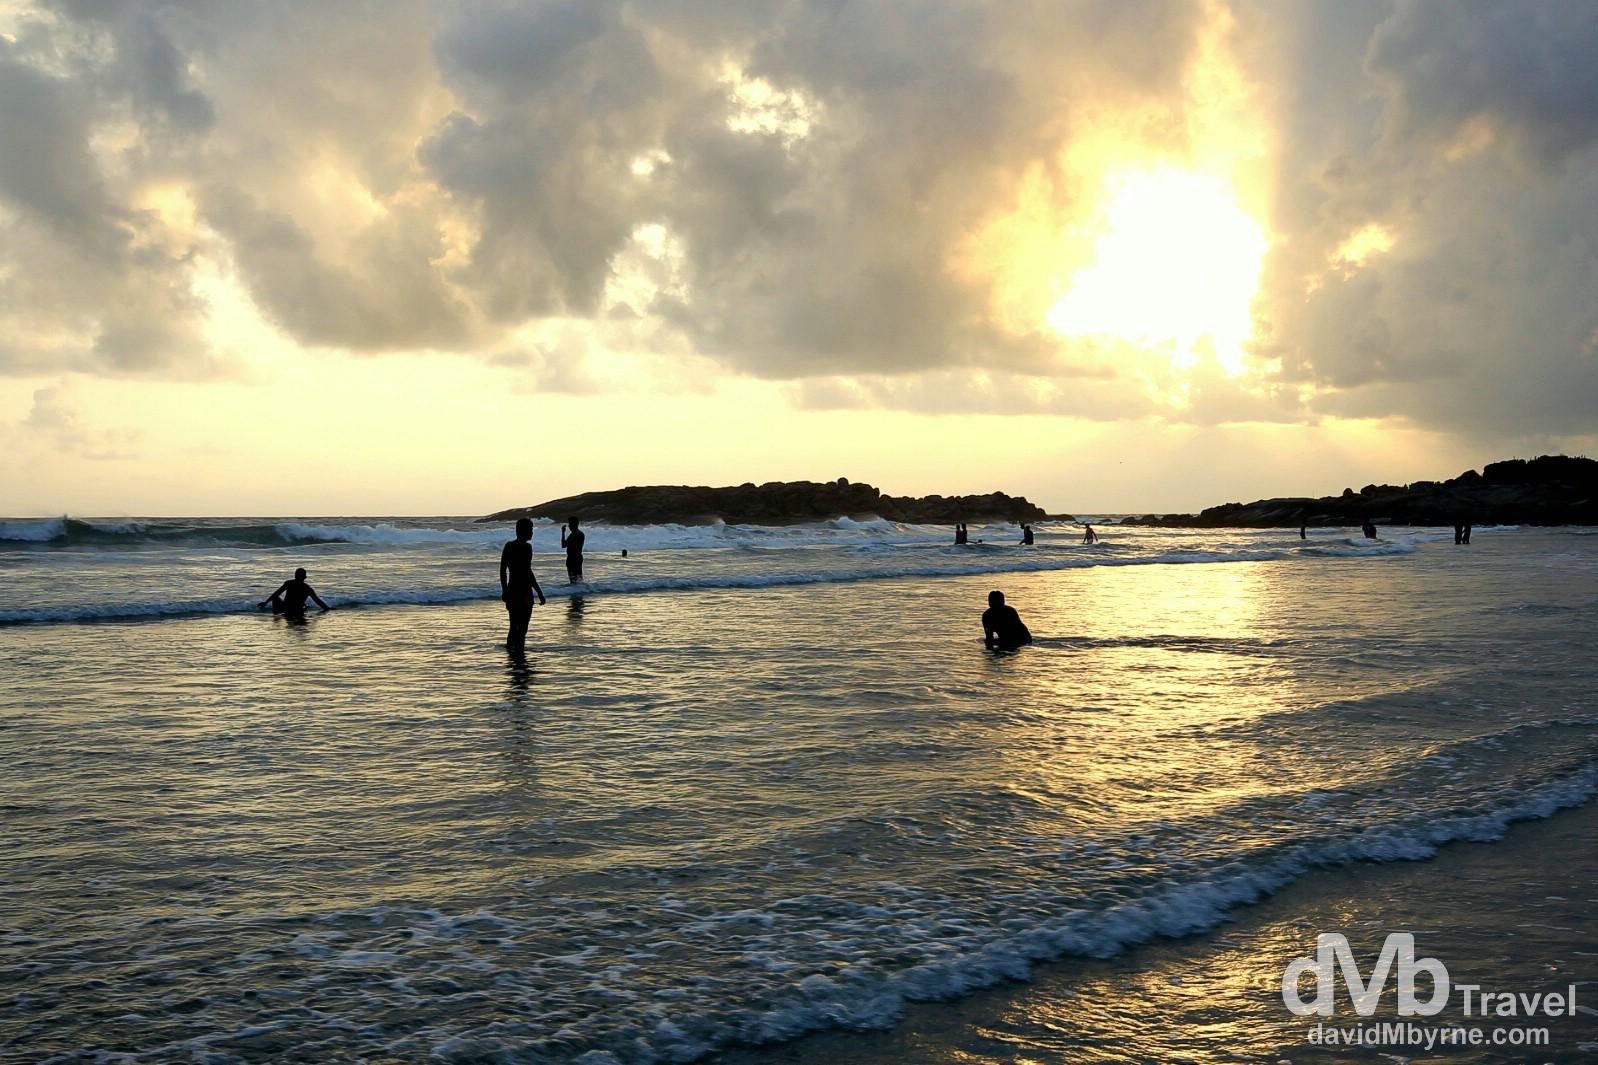 Sunset on Lighthouse Beach, Kovalam, Kerala, southwestern India. September 13th 2012.